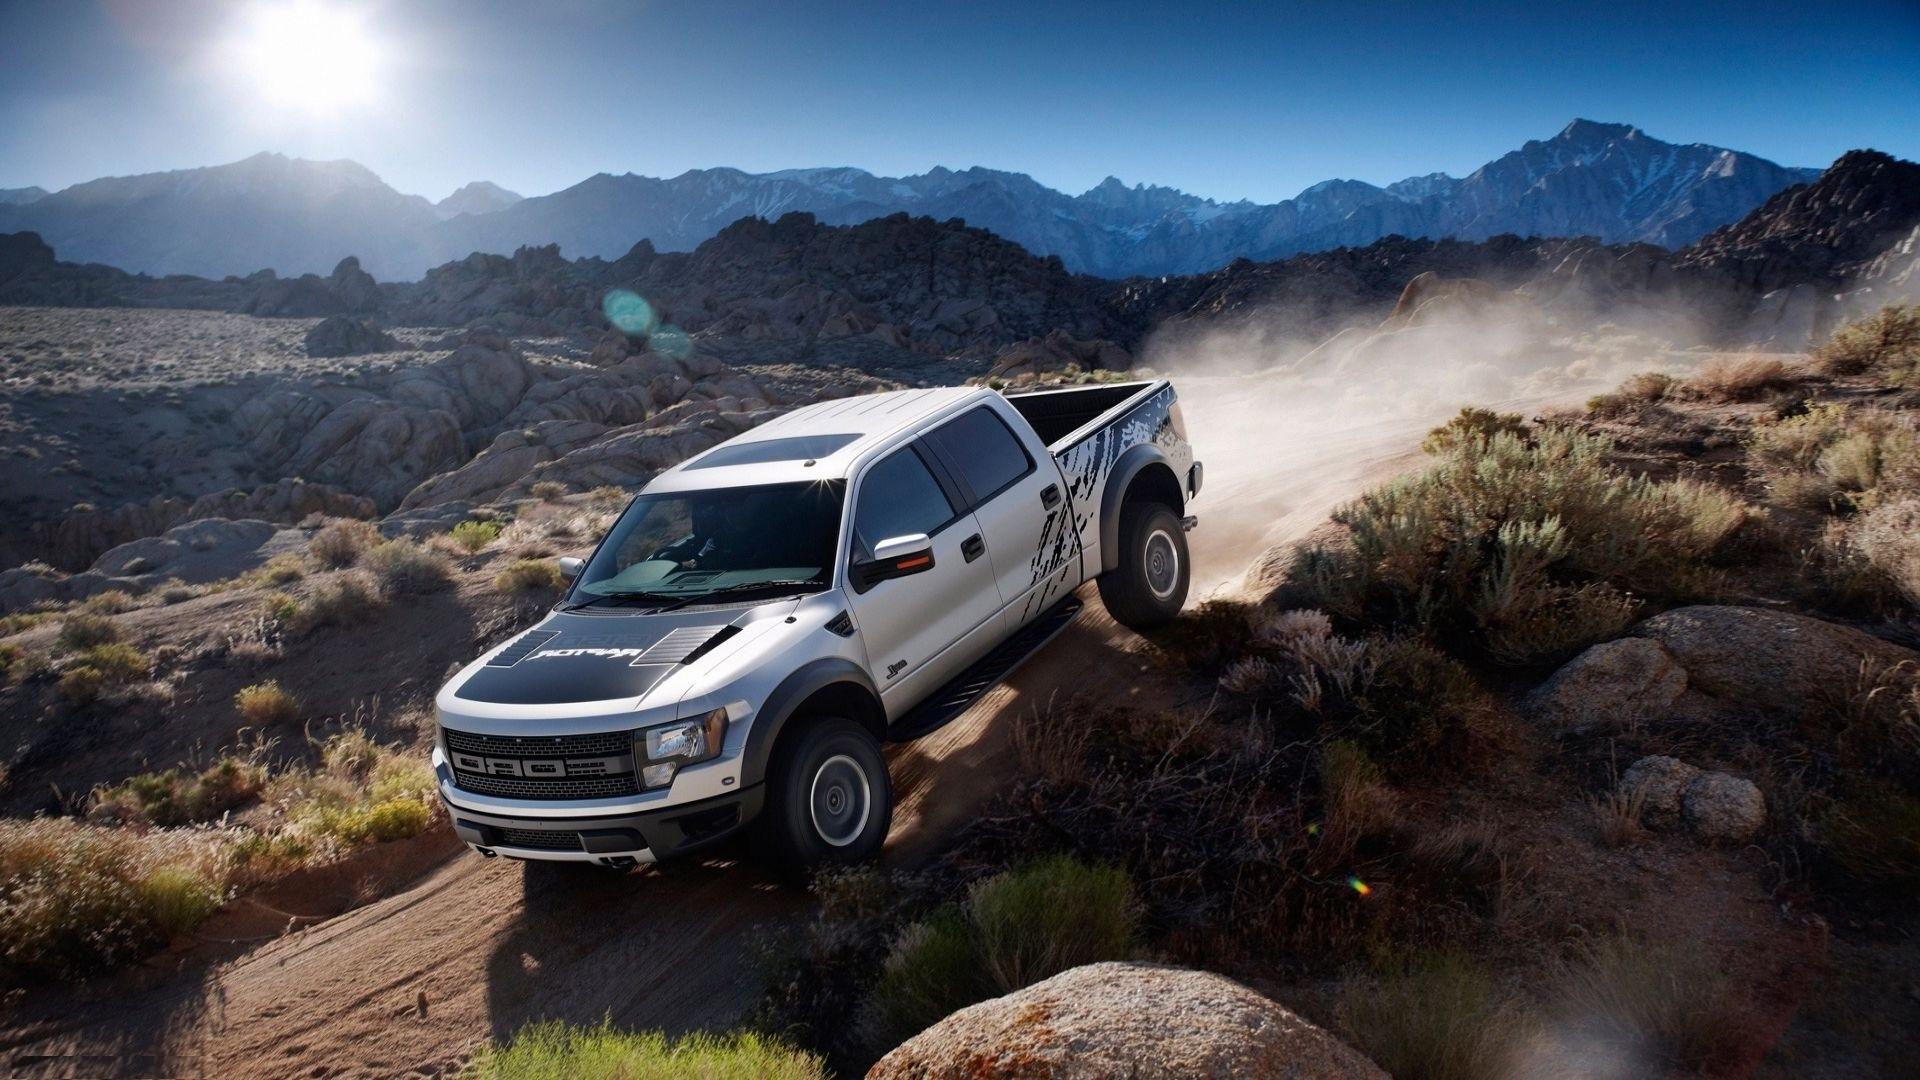 Black Ford Raptor Wallpapers 1080p